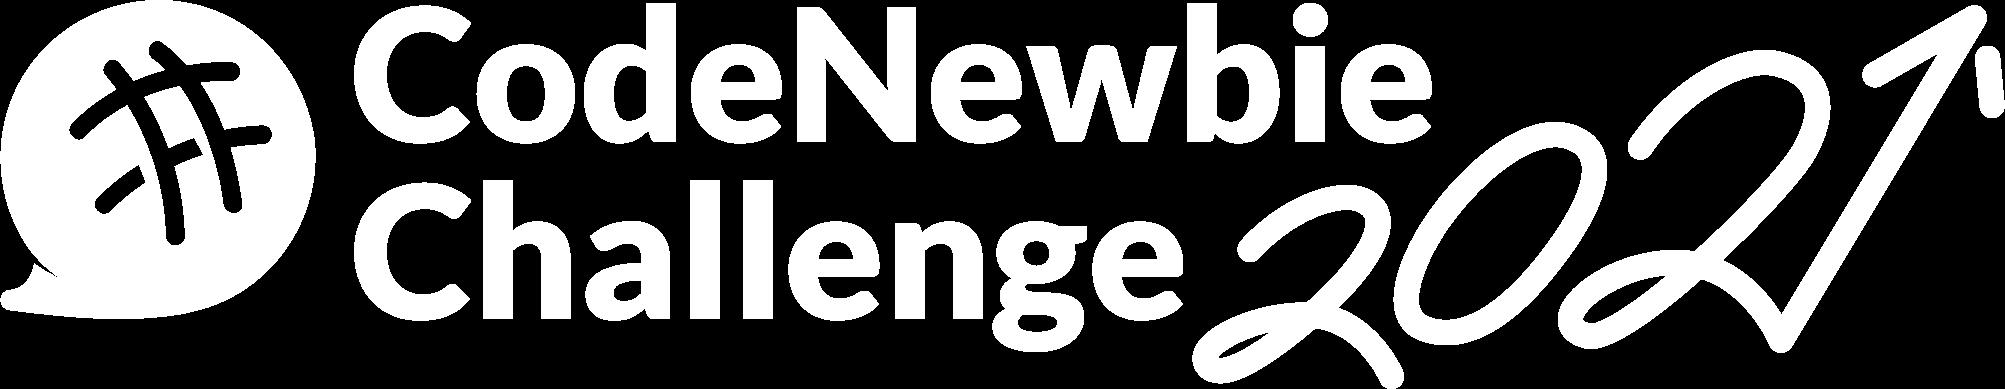 CodeNewbie Challenge 2021 Logo